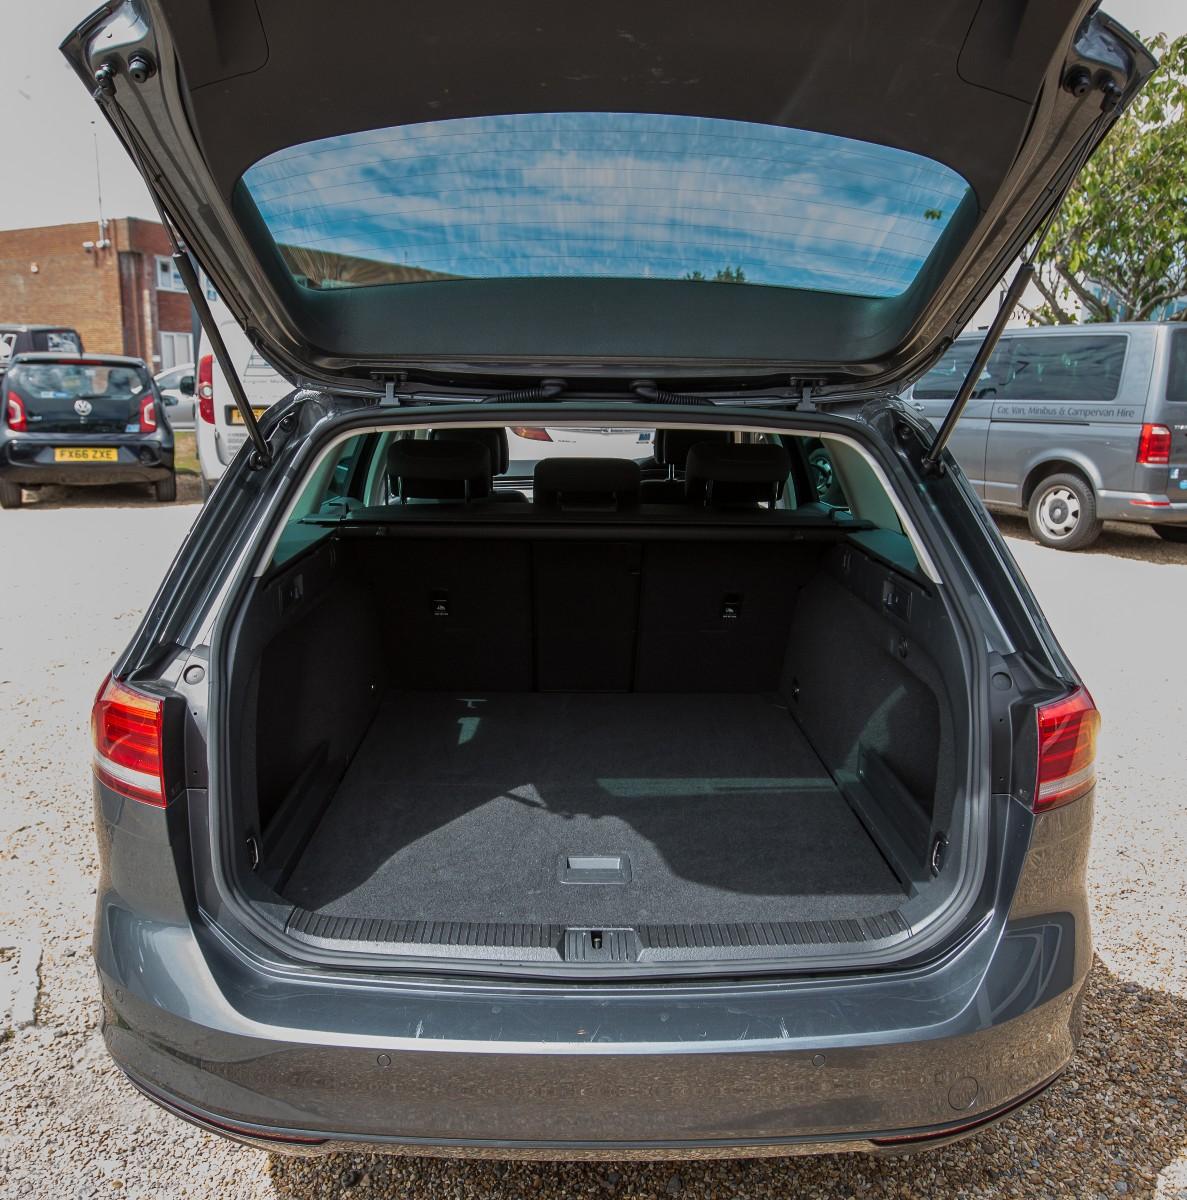 Volkswagen Passat 2.0 TDI BlueMotion Tech SE Business DSG